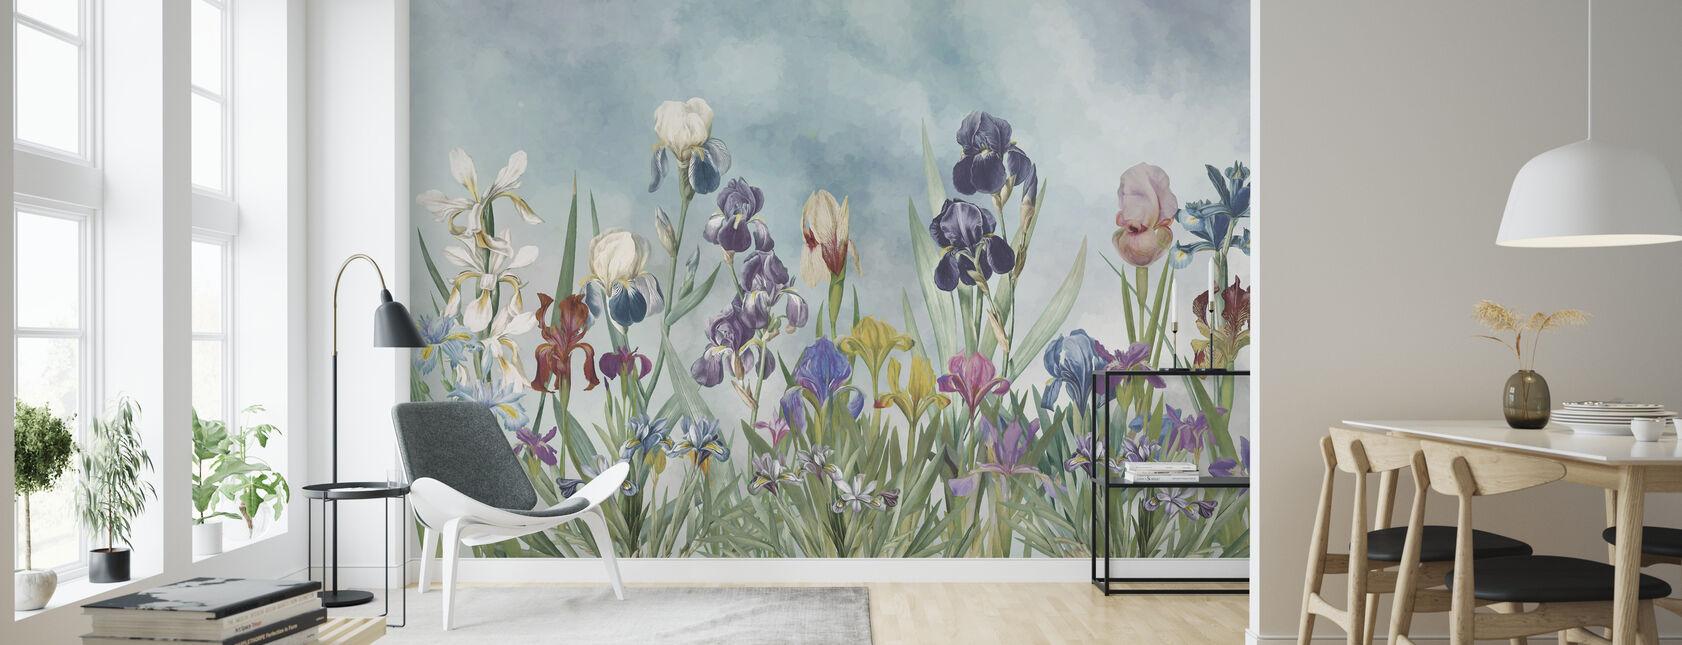 Iris Field - Wallpaper - Living Room